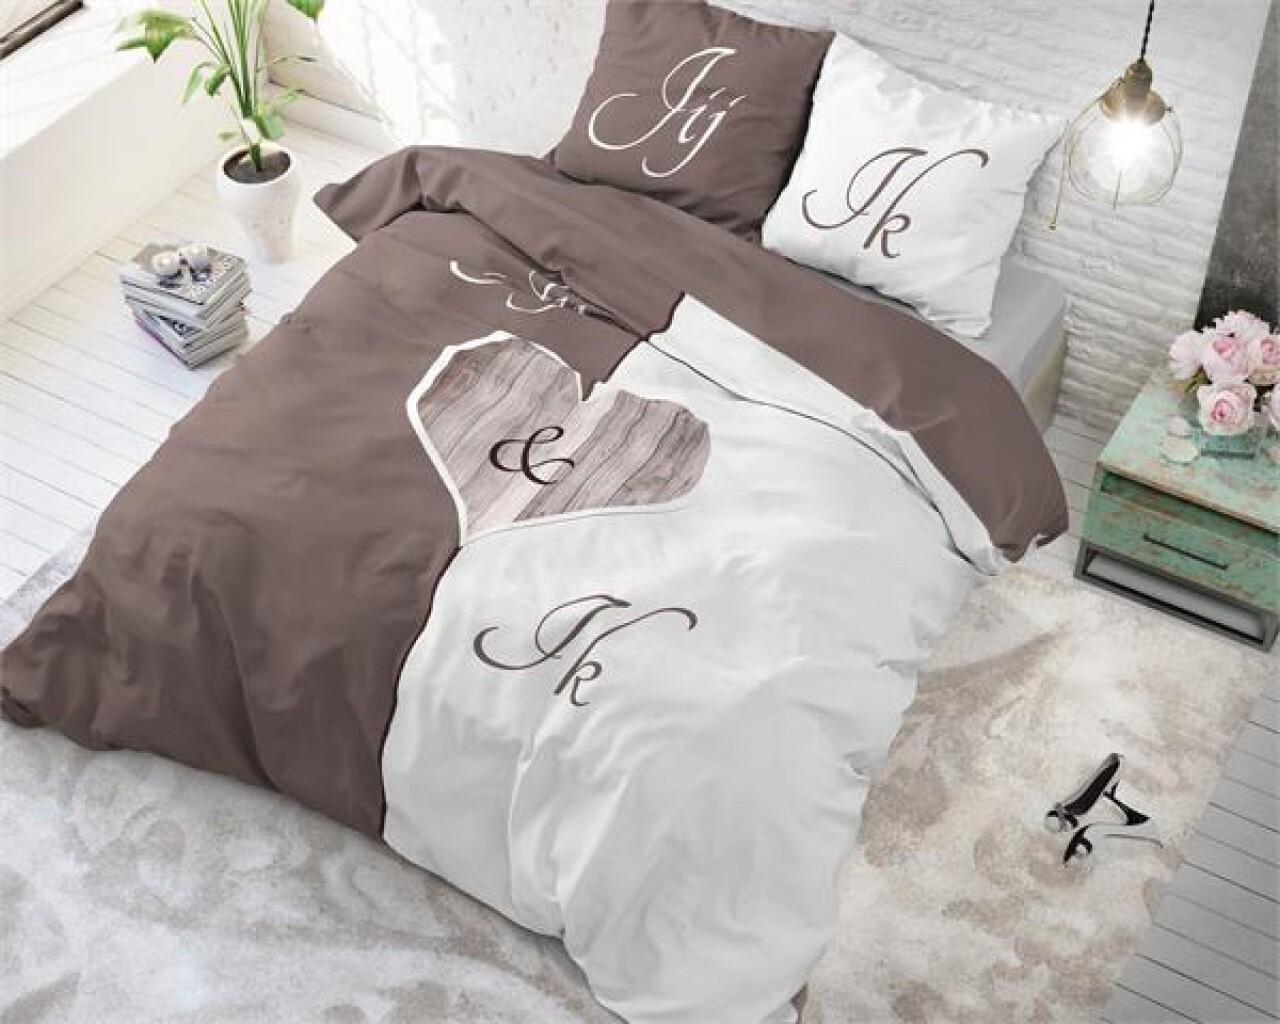 Lenjerie de pat pentru doua persoane Jij en Ik Cream, Royal Textile,100% bumbac